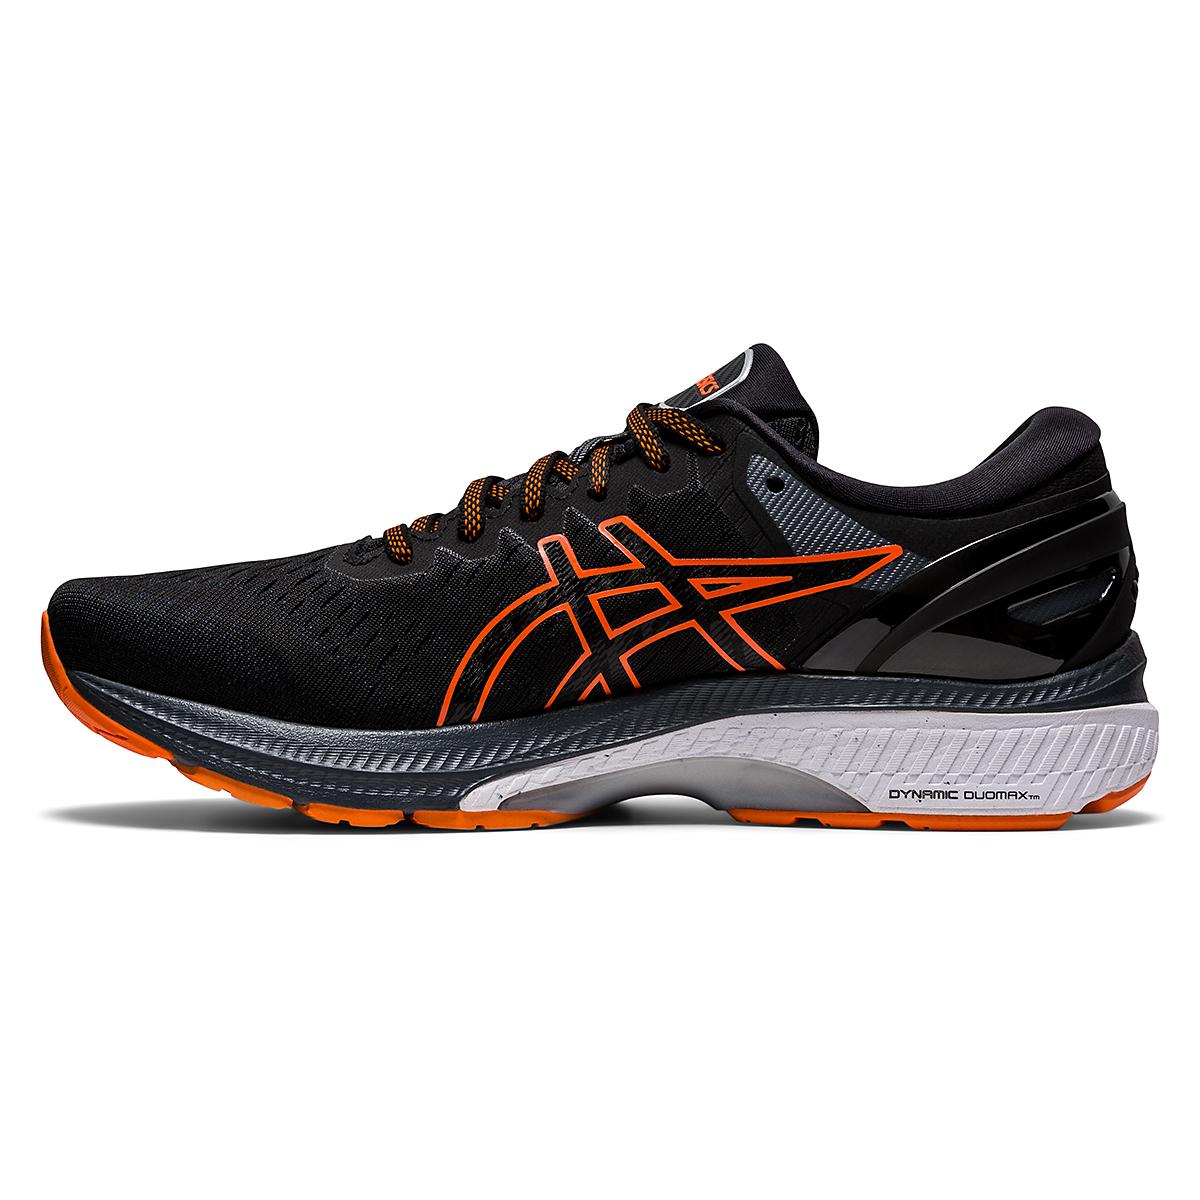 Men's Asics GEL-Kayano 27 Running Shoe - Color: Black/Marigold - Size: 7.5 - Width: Regular, Black/Marigold, large, image 2